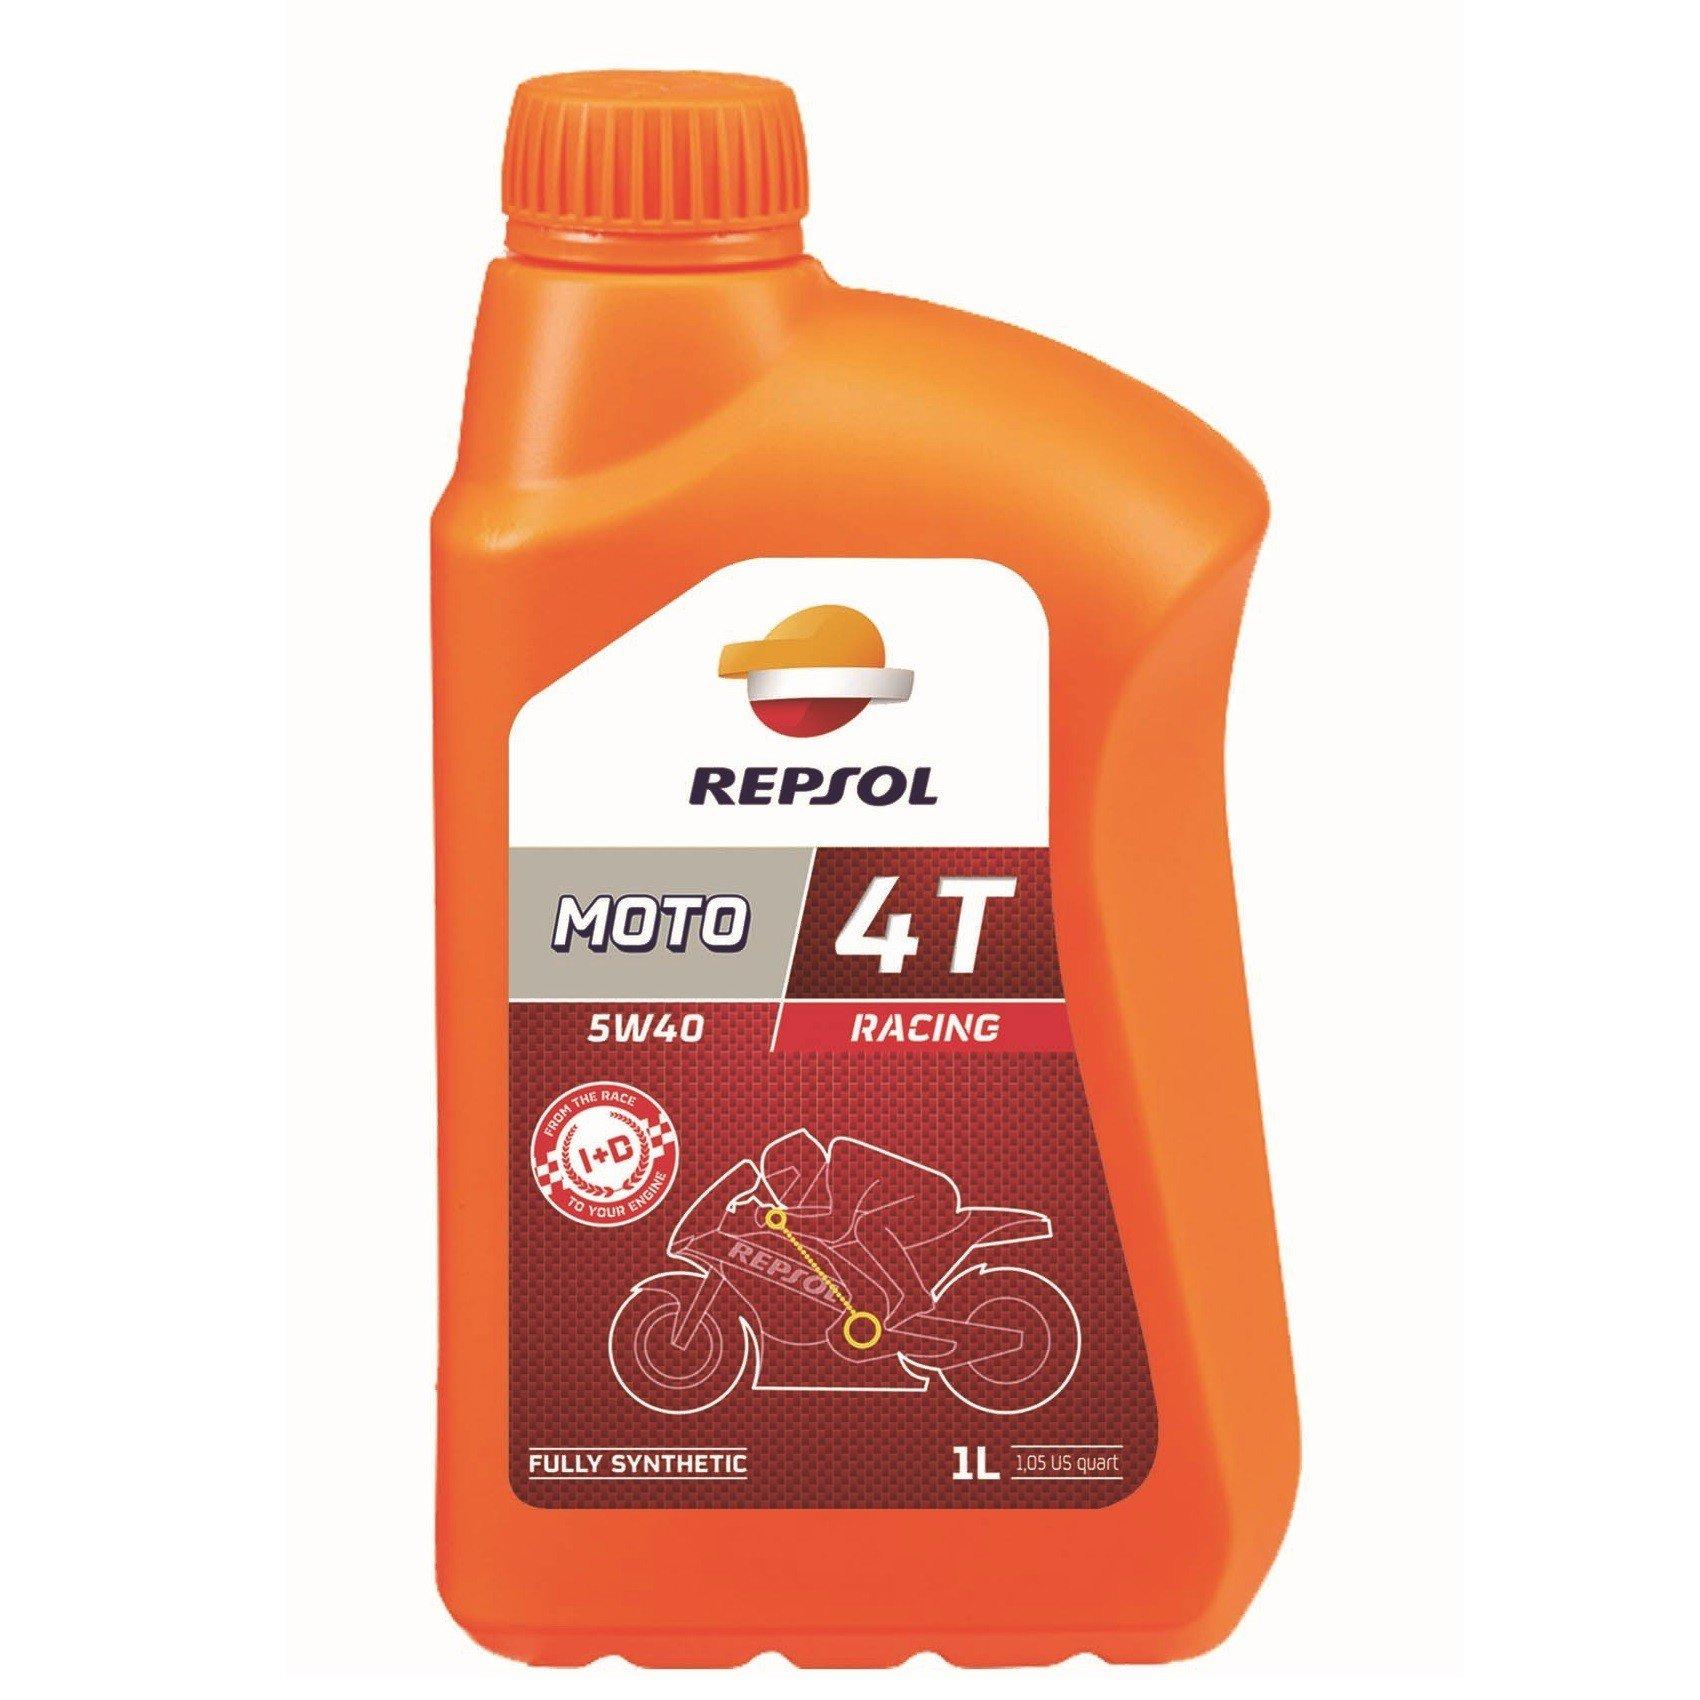 Repsol Moto Racing 4T 5W40, 1L